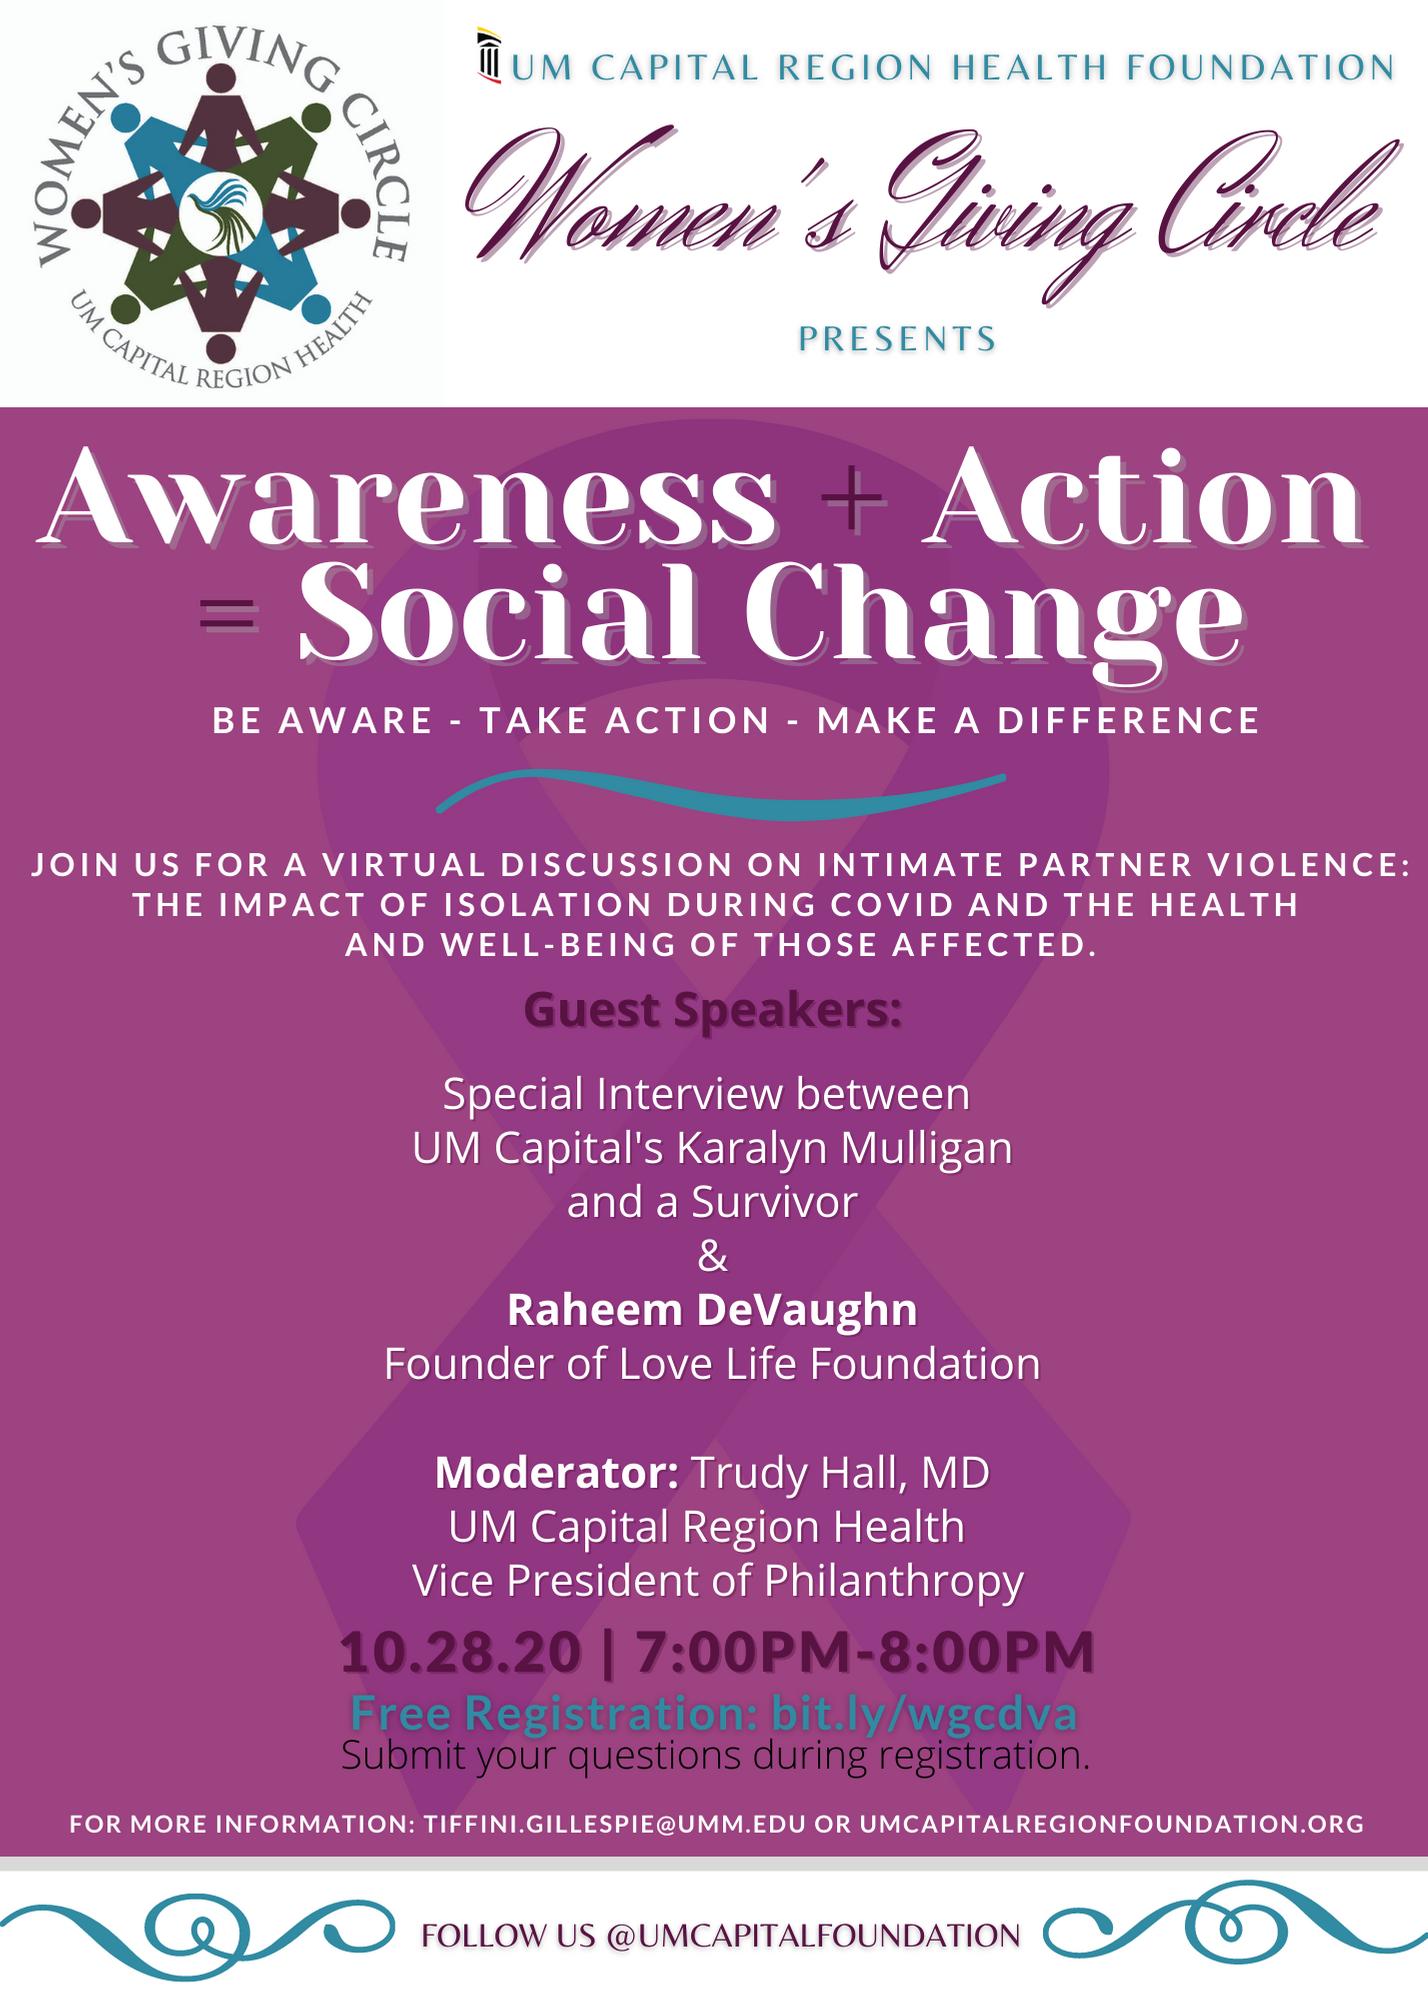 Awareness + Action = Social Change - 10/28